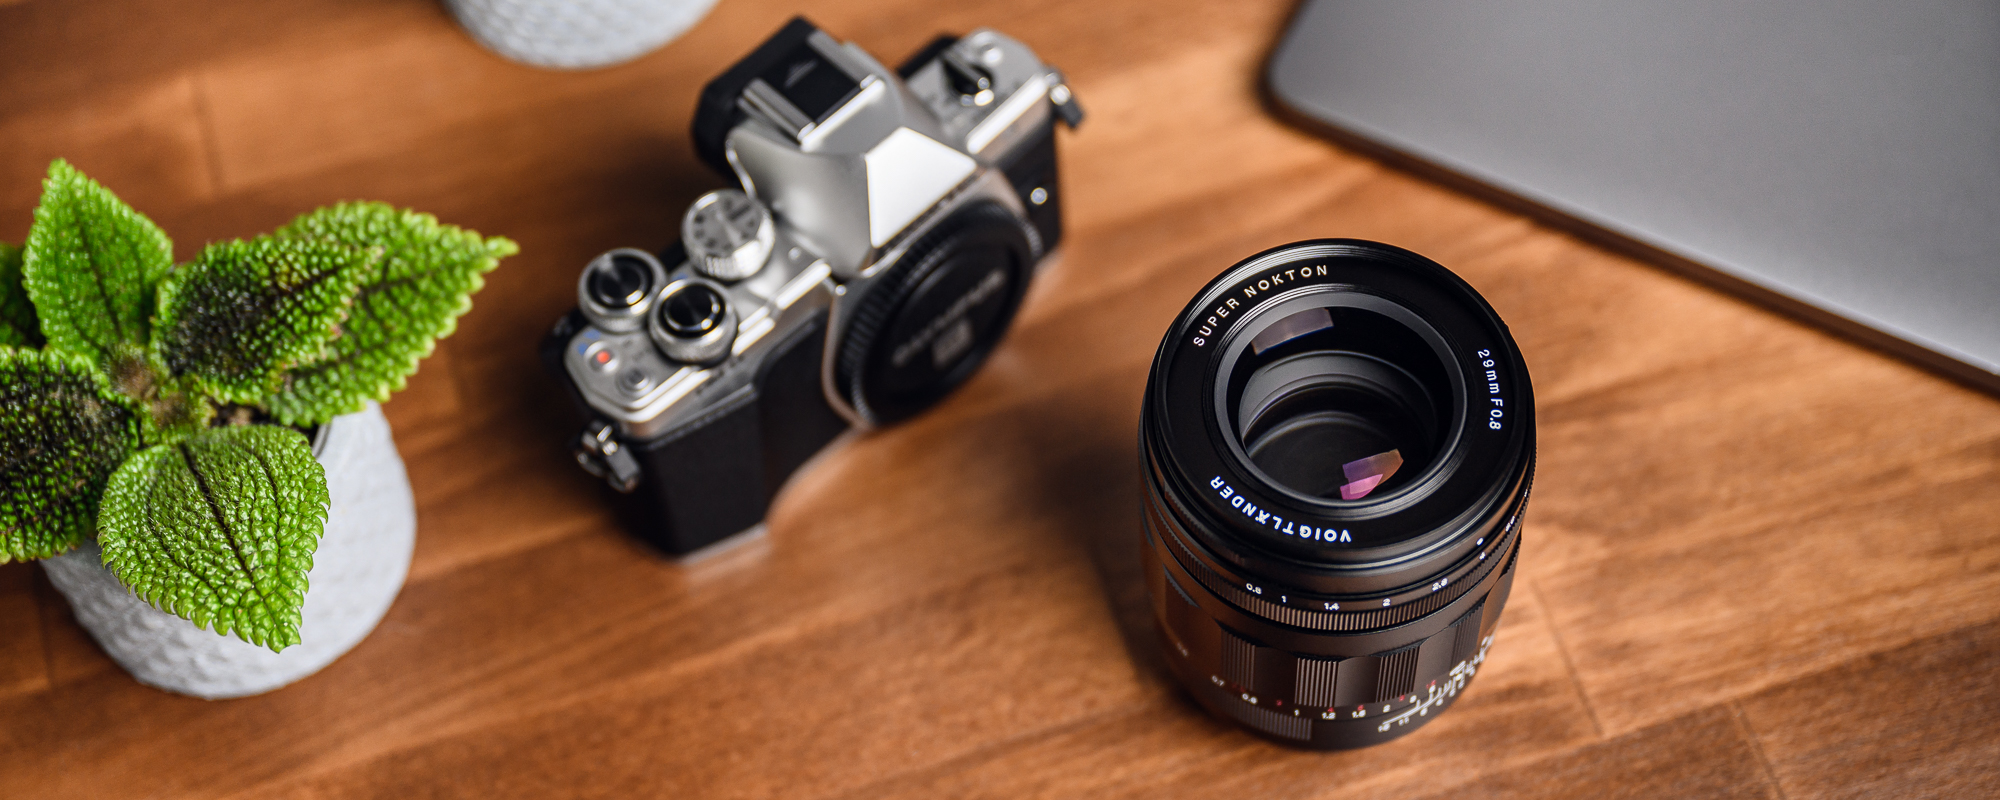 Voigtlander Super Nokton 29mm f/0.8 lens for Micro 4/3 on desktop